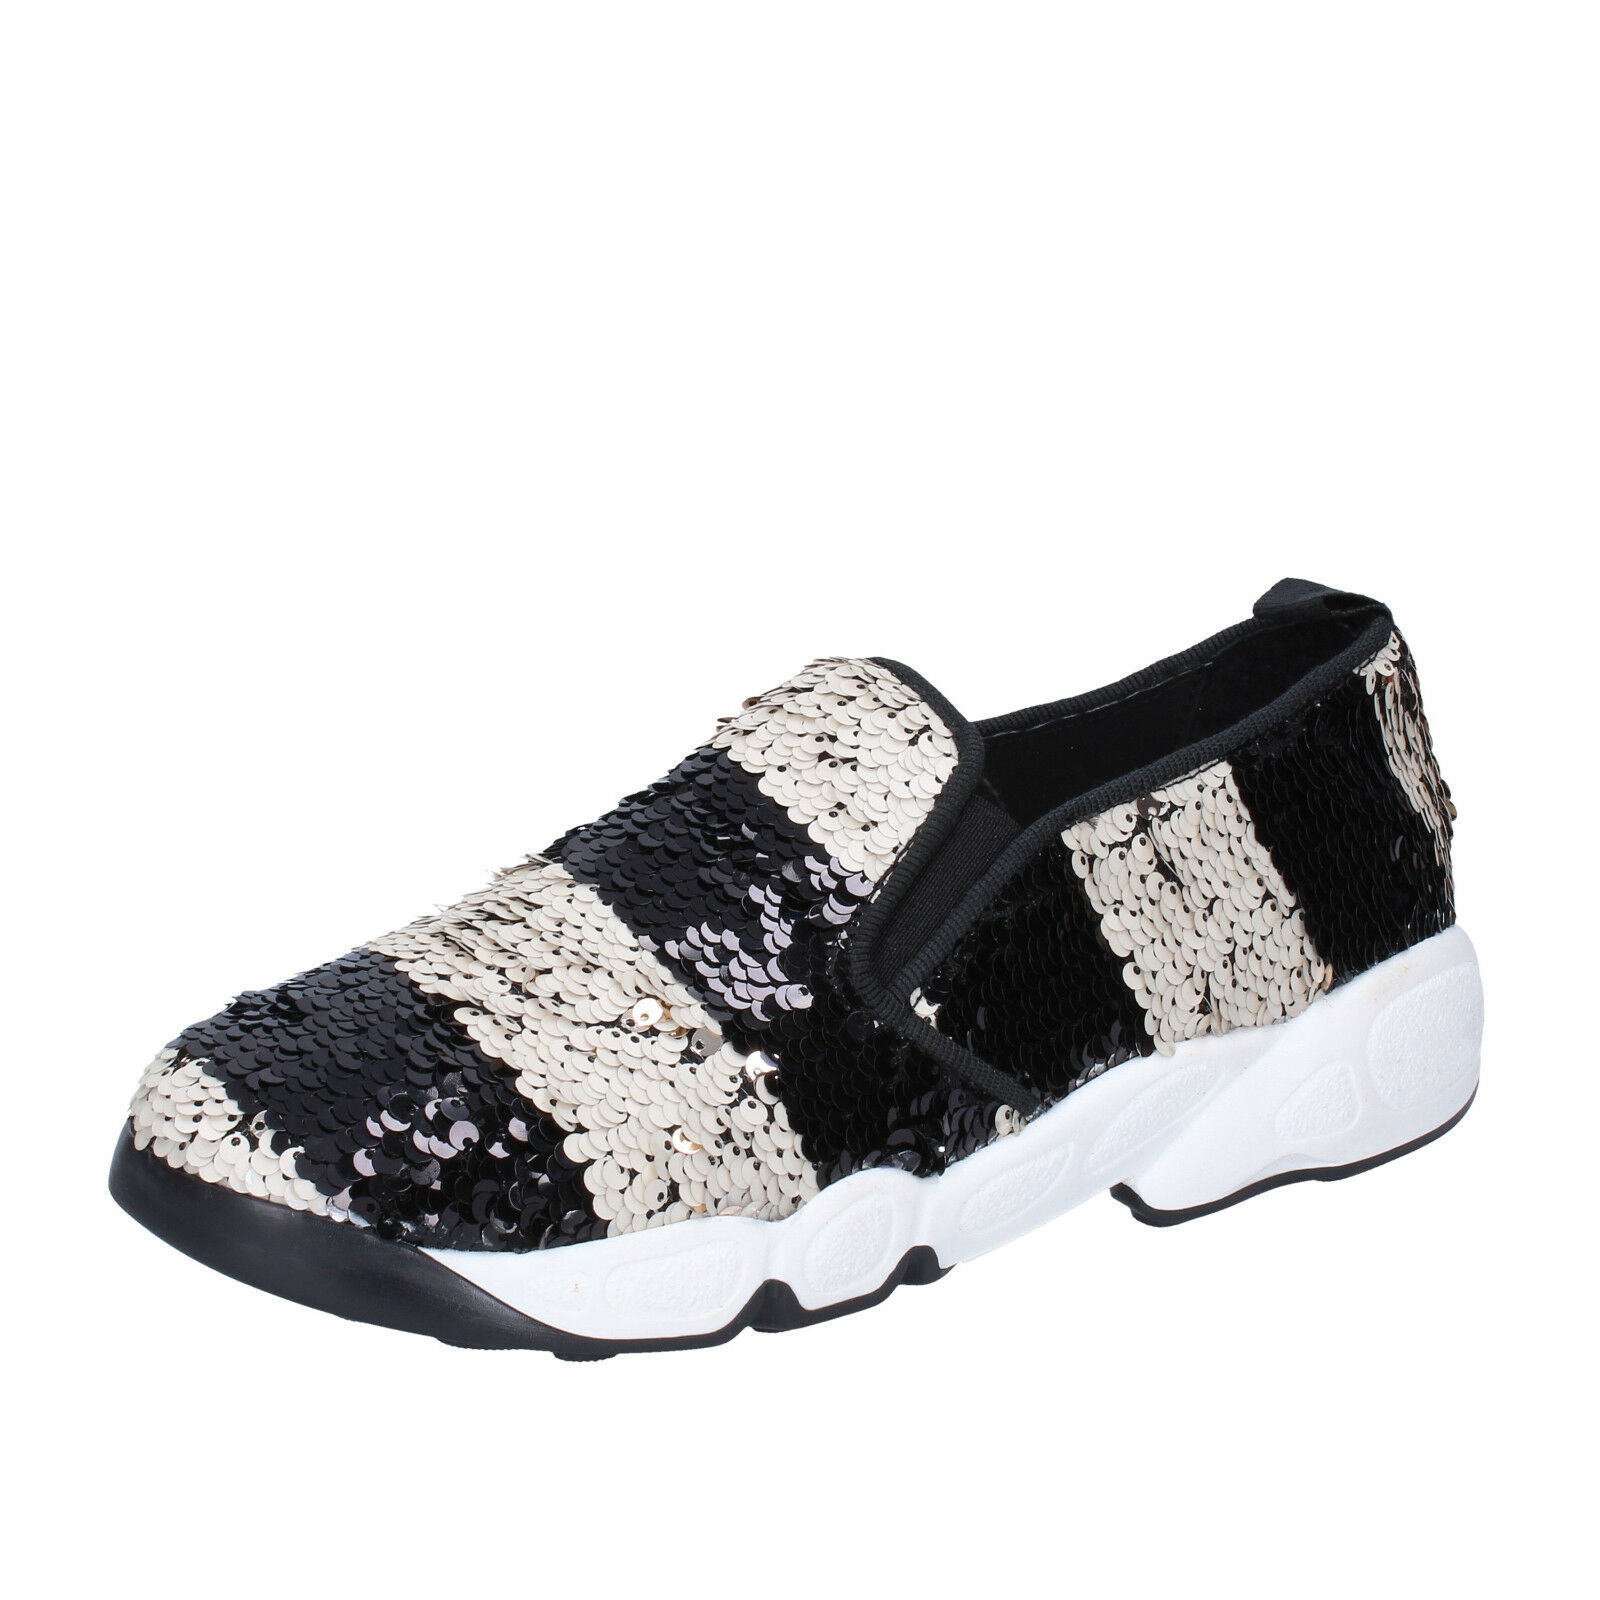 scarpe donna NILA & NILA 38 EU slip on mocassini bianco nero pailettes BX769-38